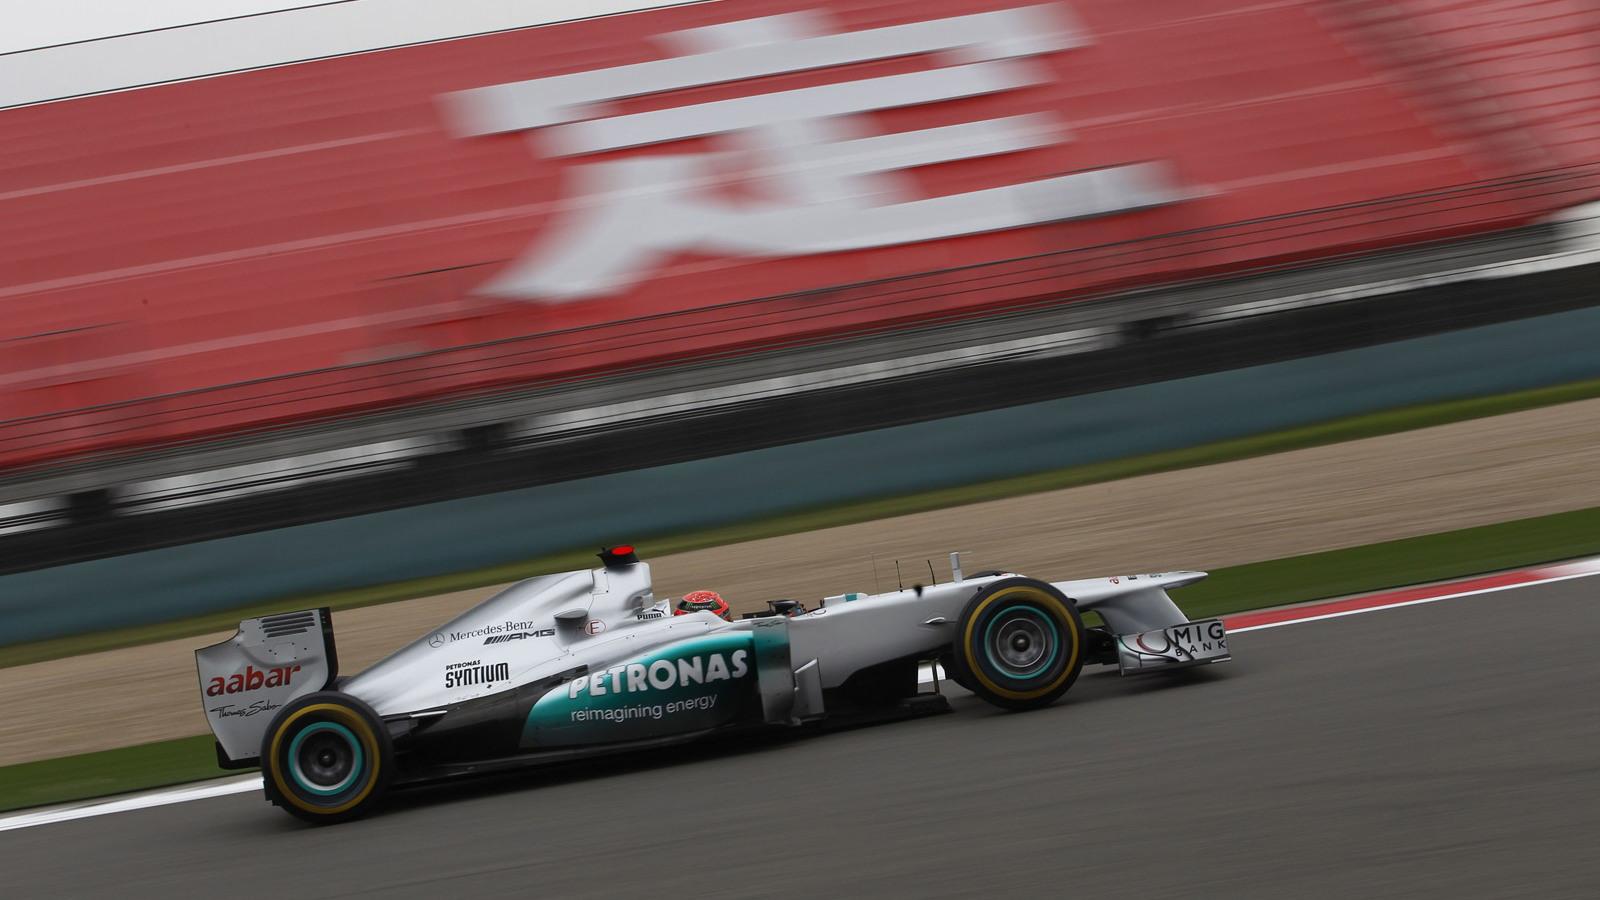 Mercedes AMG at the 2012 Formula 1 Chinese Grand Prix